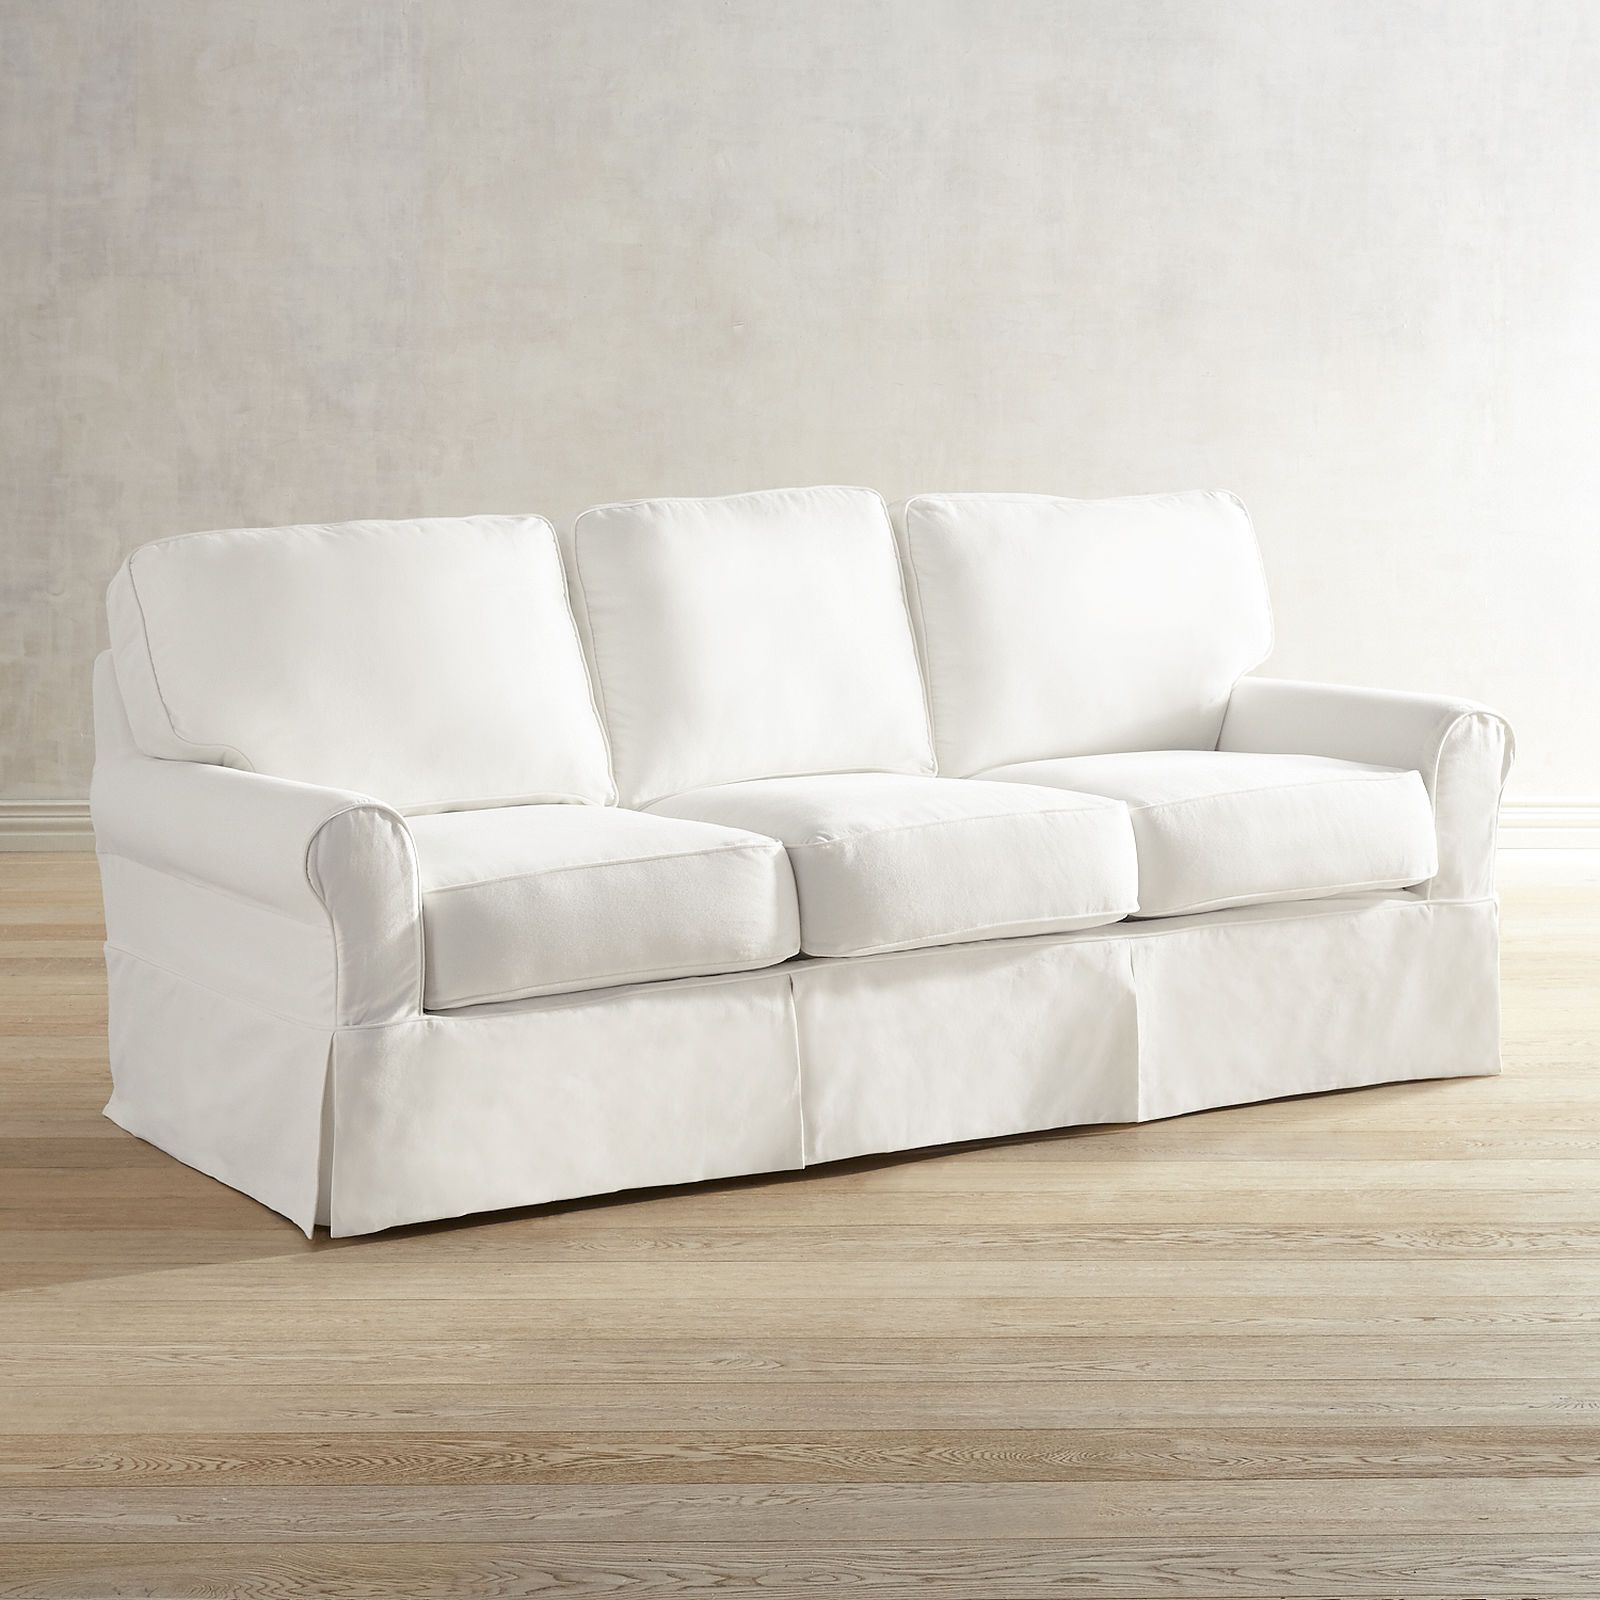 Lia Pierformance White Slipcovered